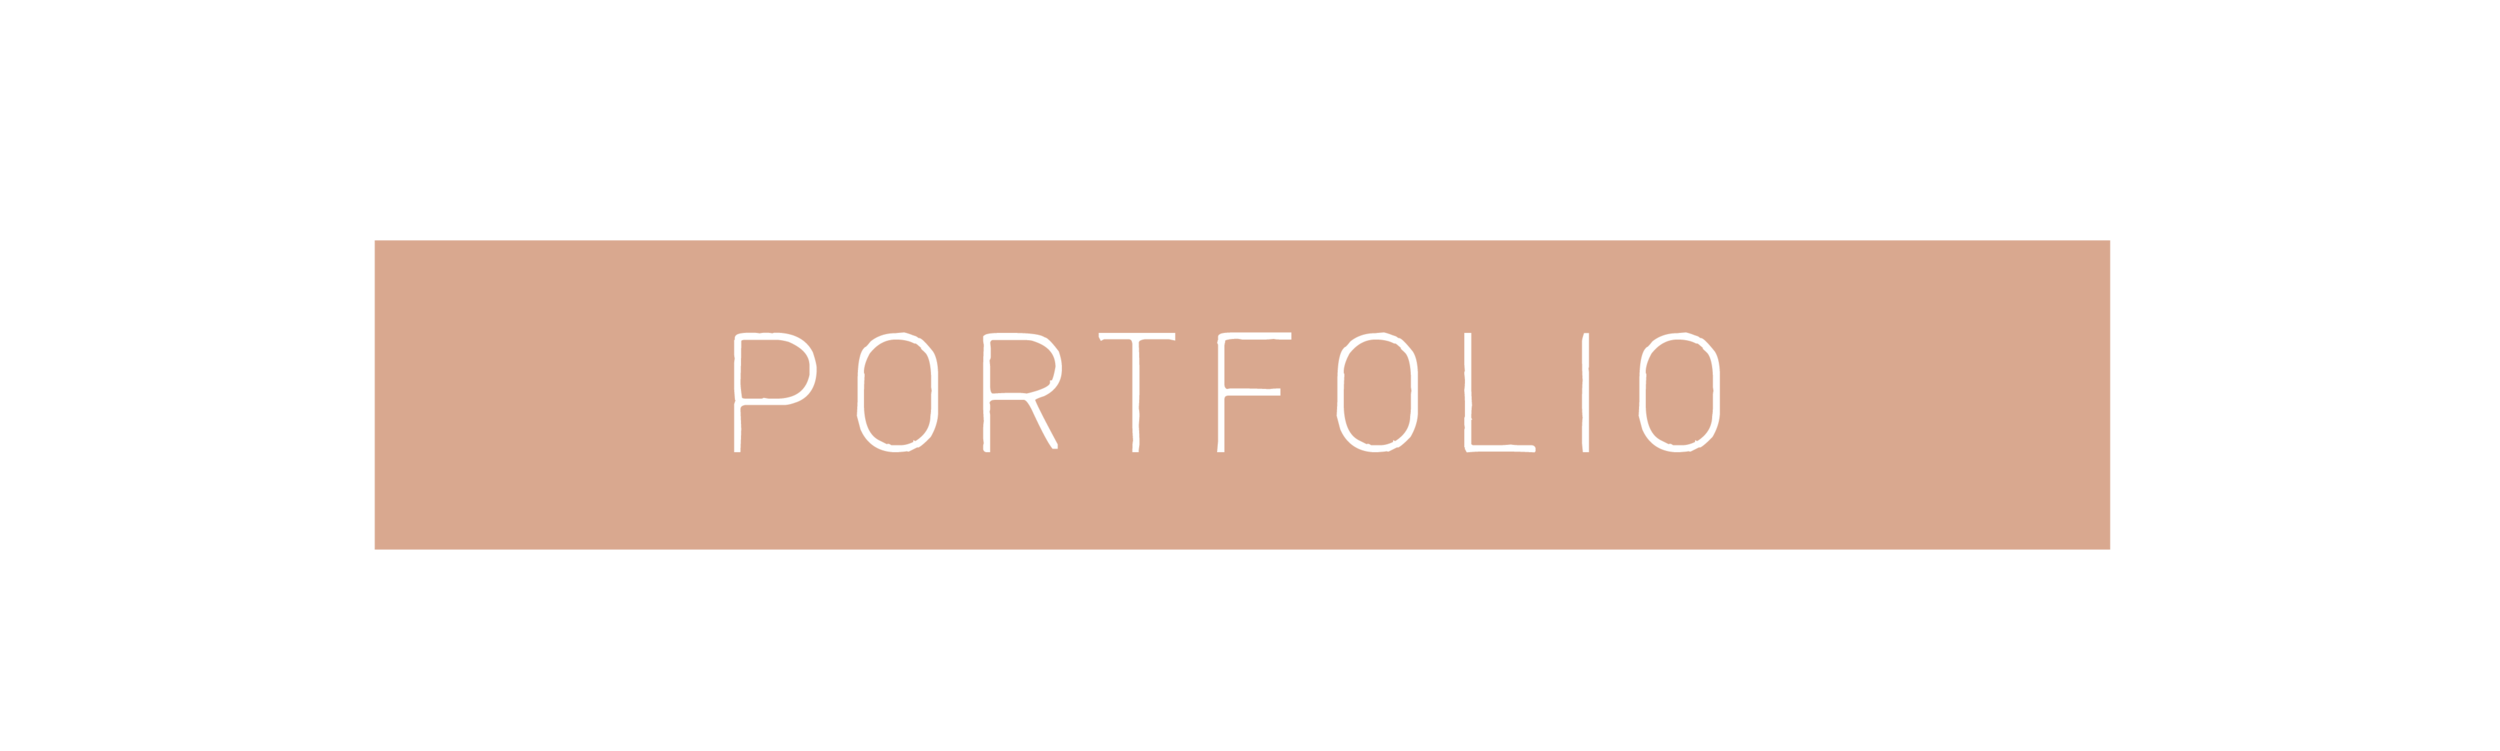 Families Portfolio